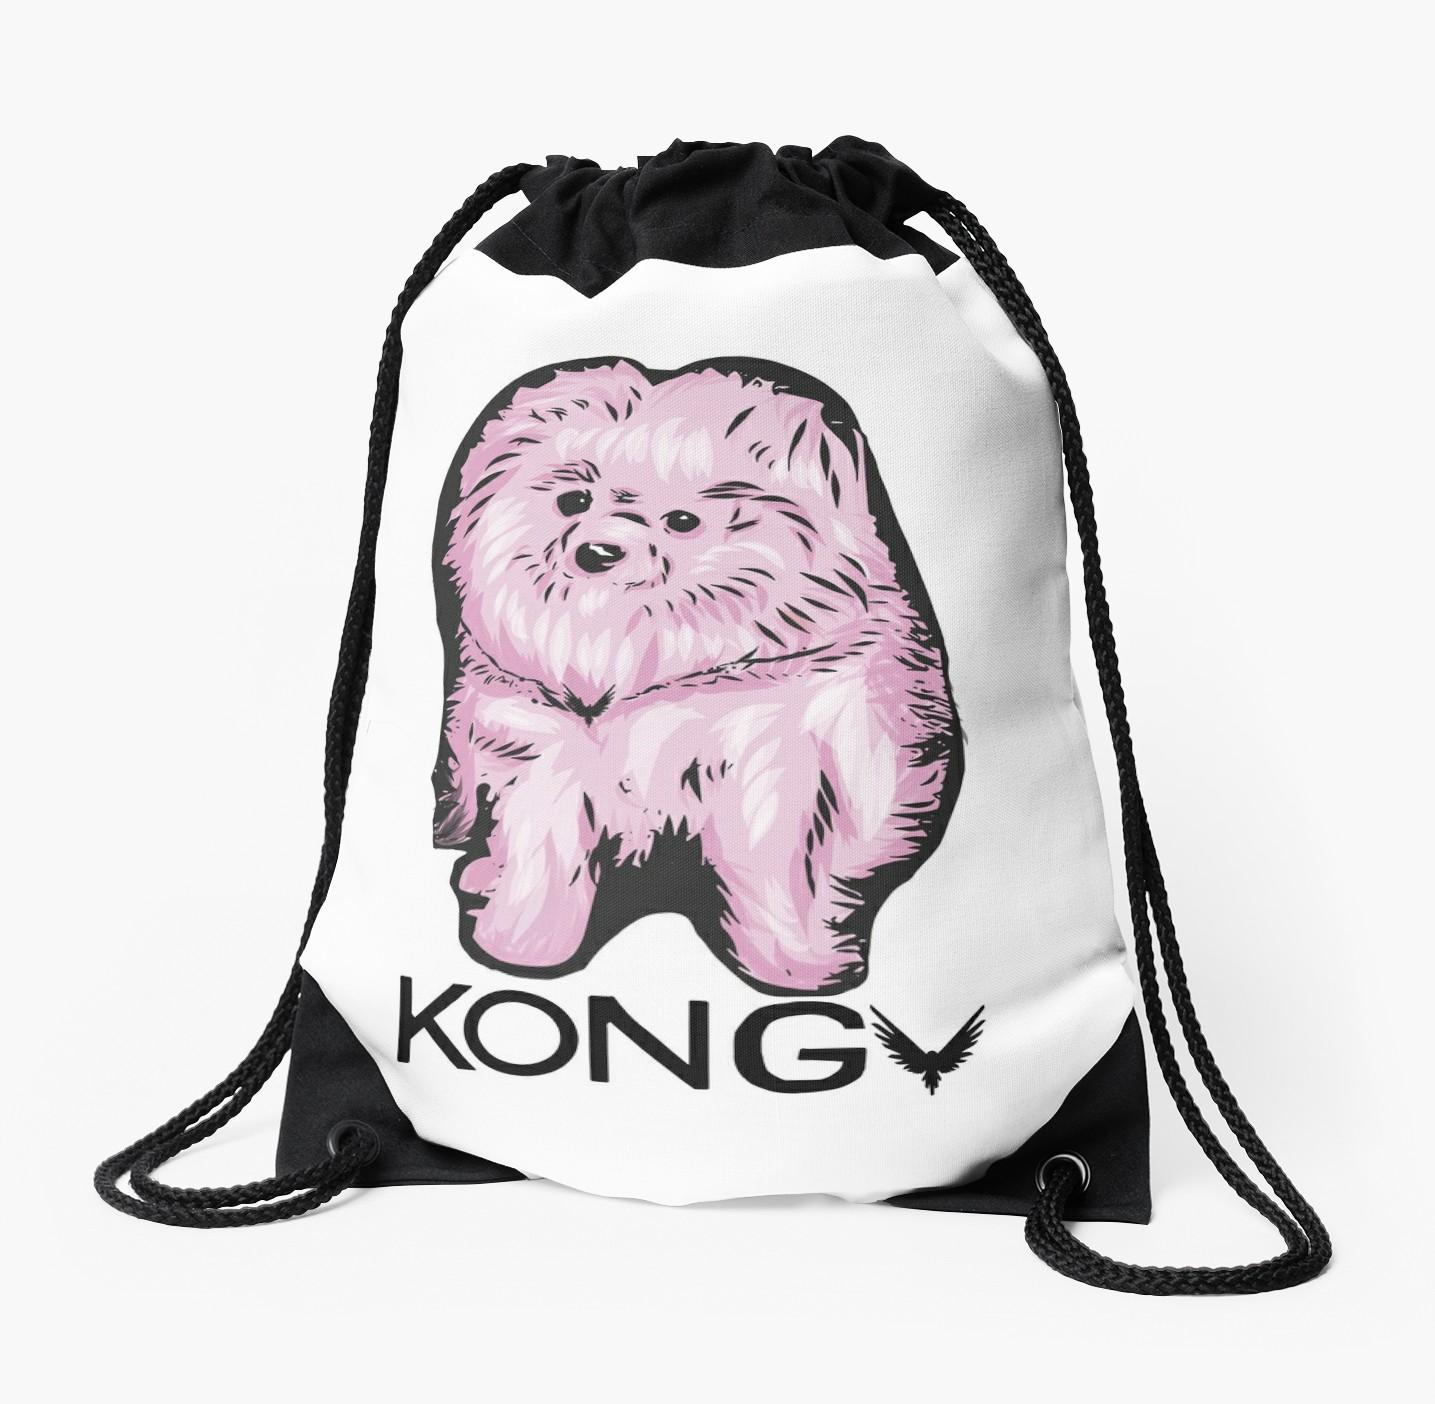 1435x1404 Kong Da Savage Drawstring Bags By Heyashtag Redbubble